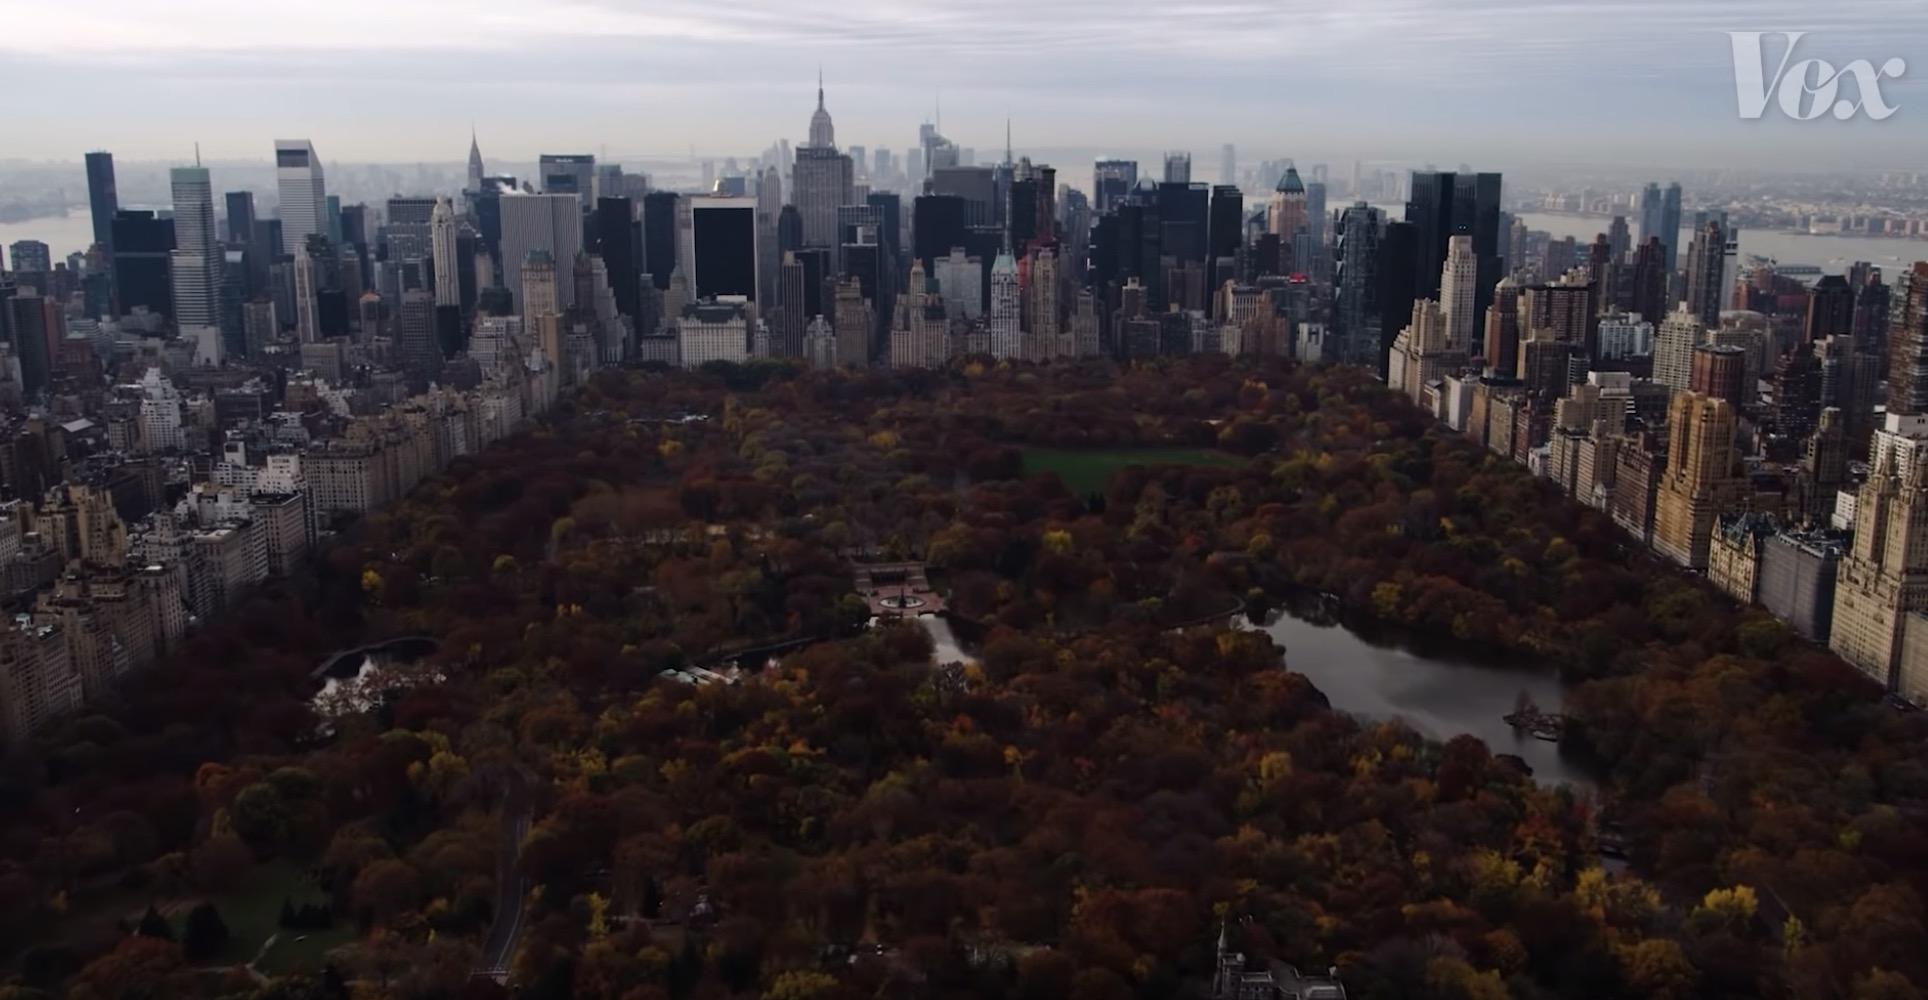 The Lost, Forgotten Neighborhood Under Central Park